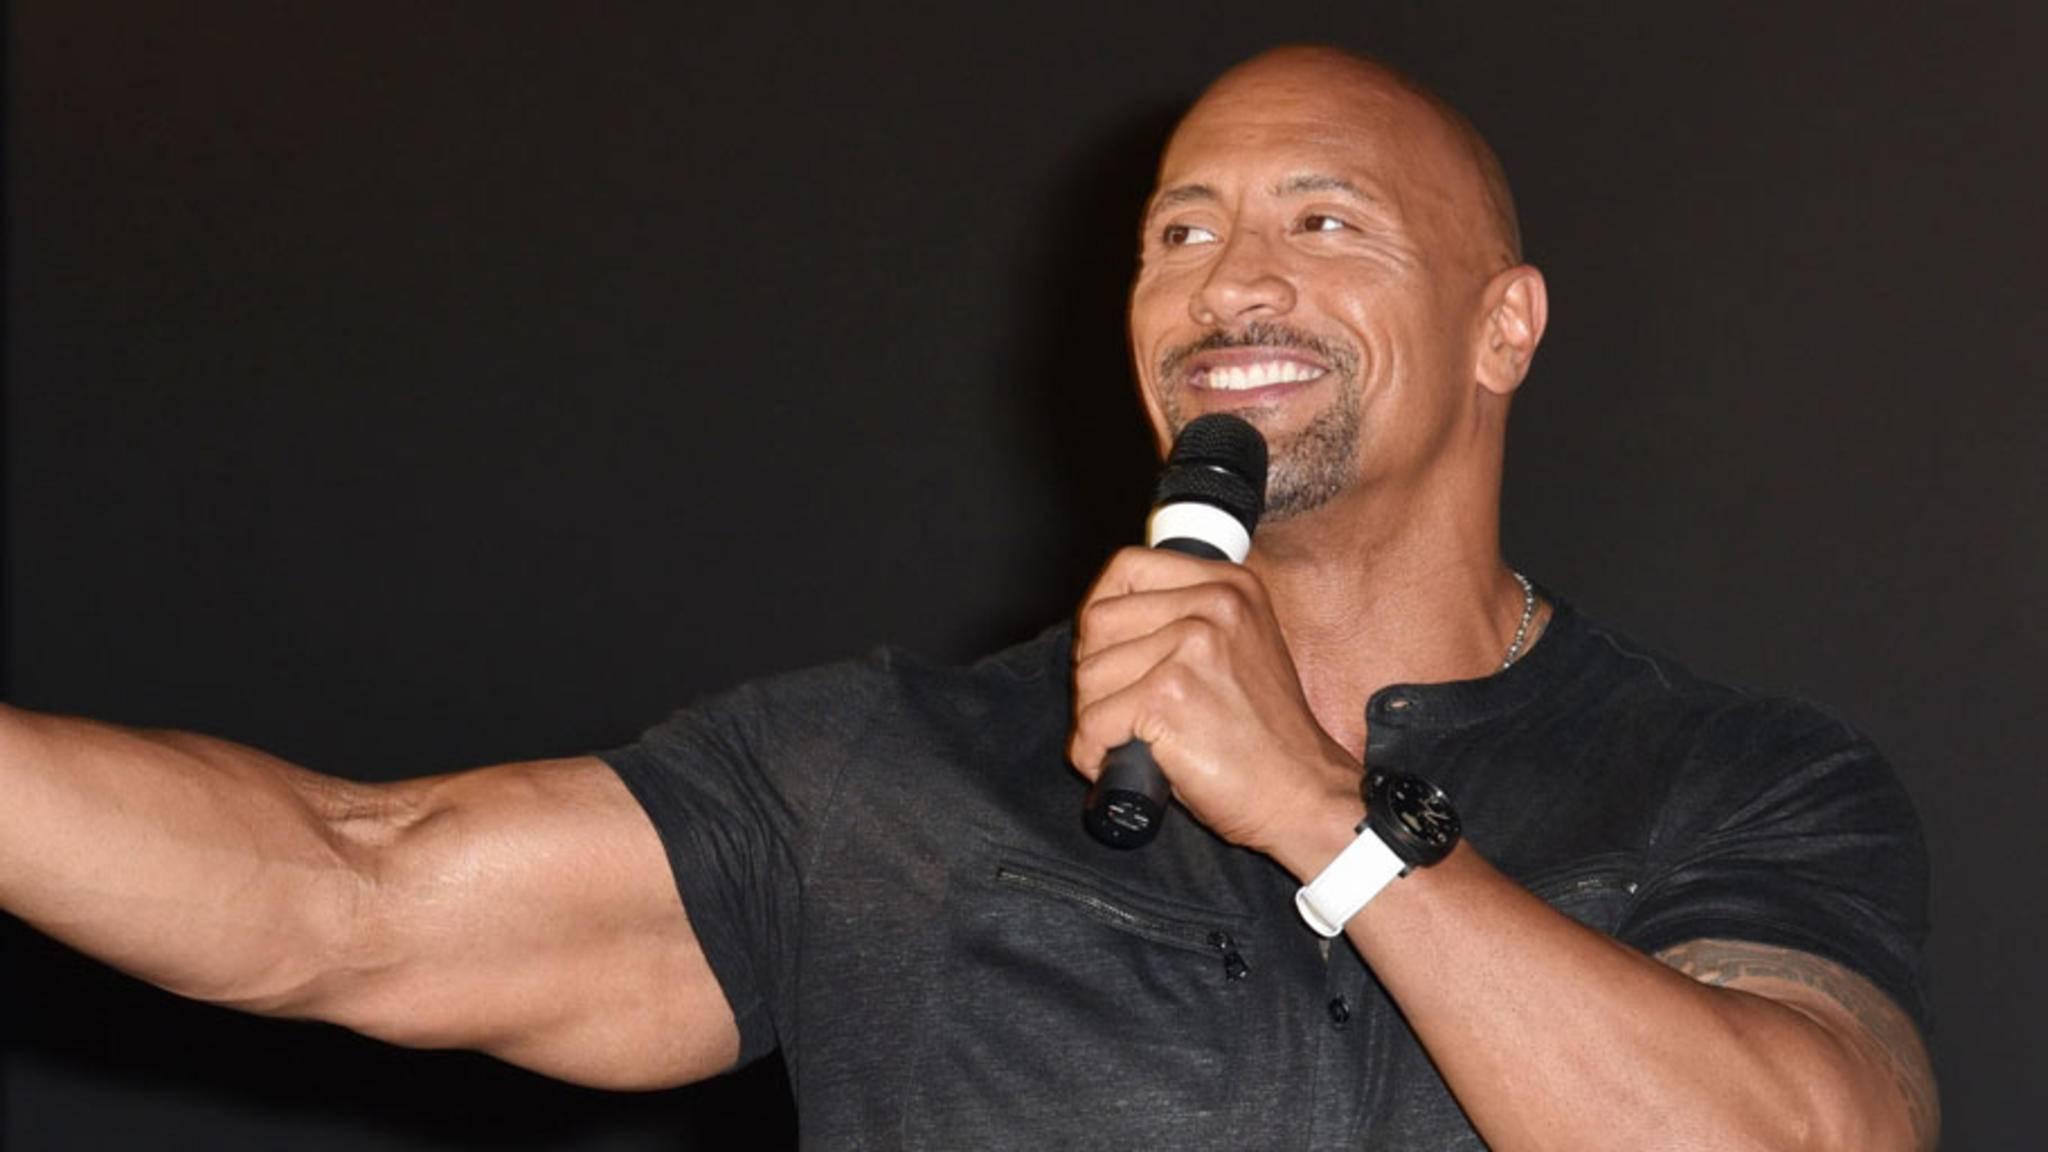 Sehen wir Dwayne Johnson bald als Superschurken?